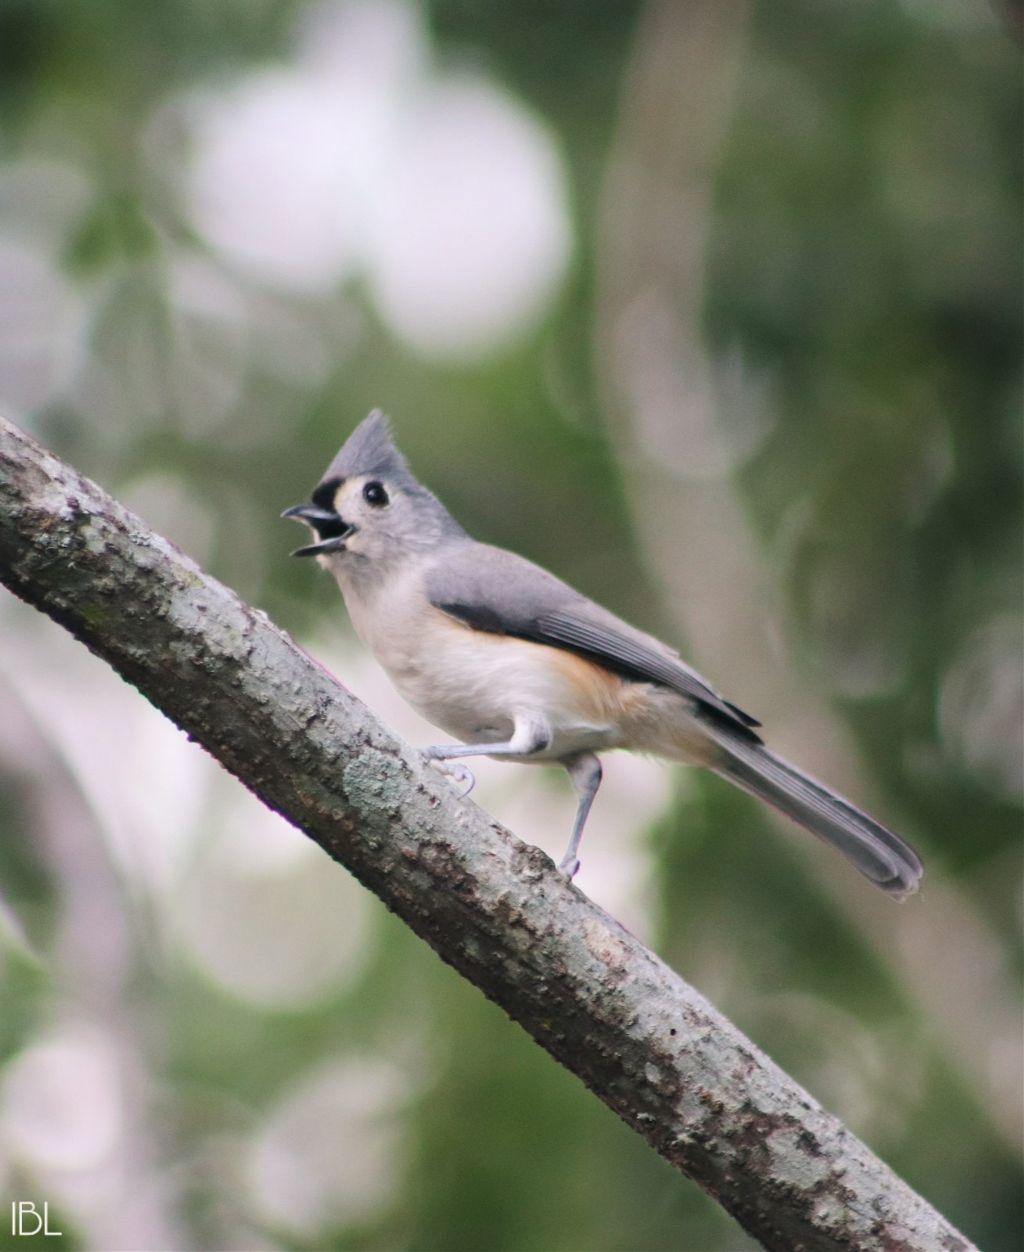 #freetoedit #bird #thingsinmybackyard #cute #titmouse #bokeh #nature #colorful #photography